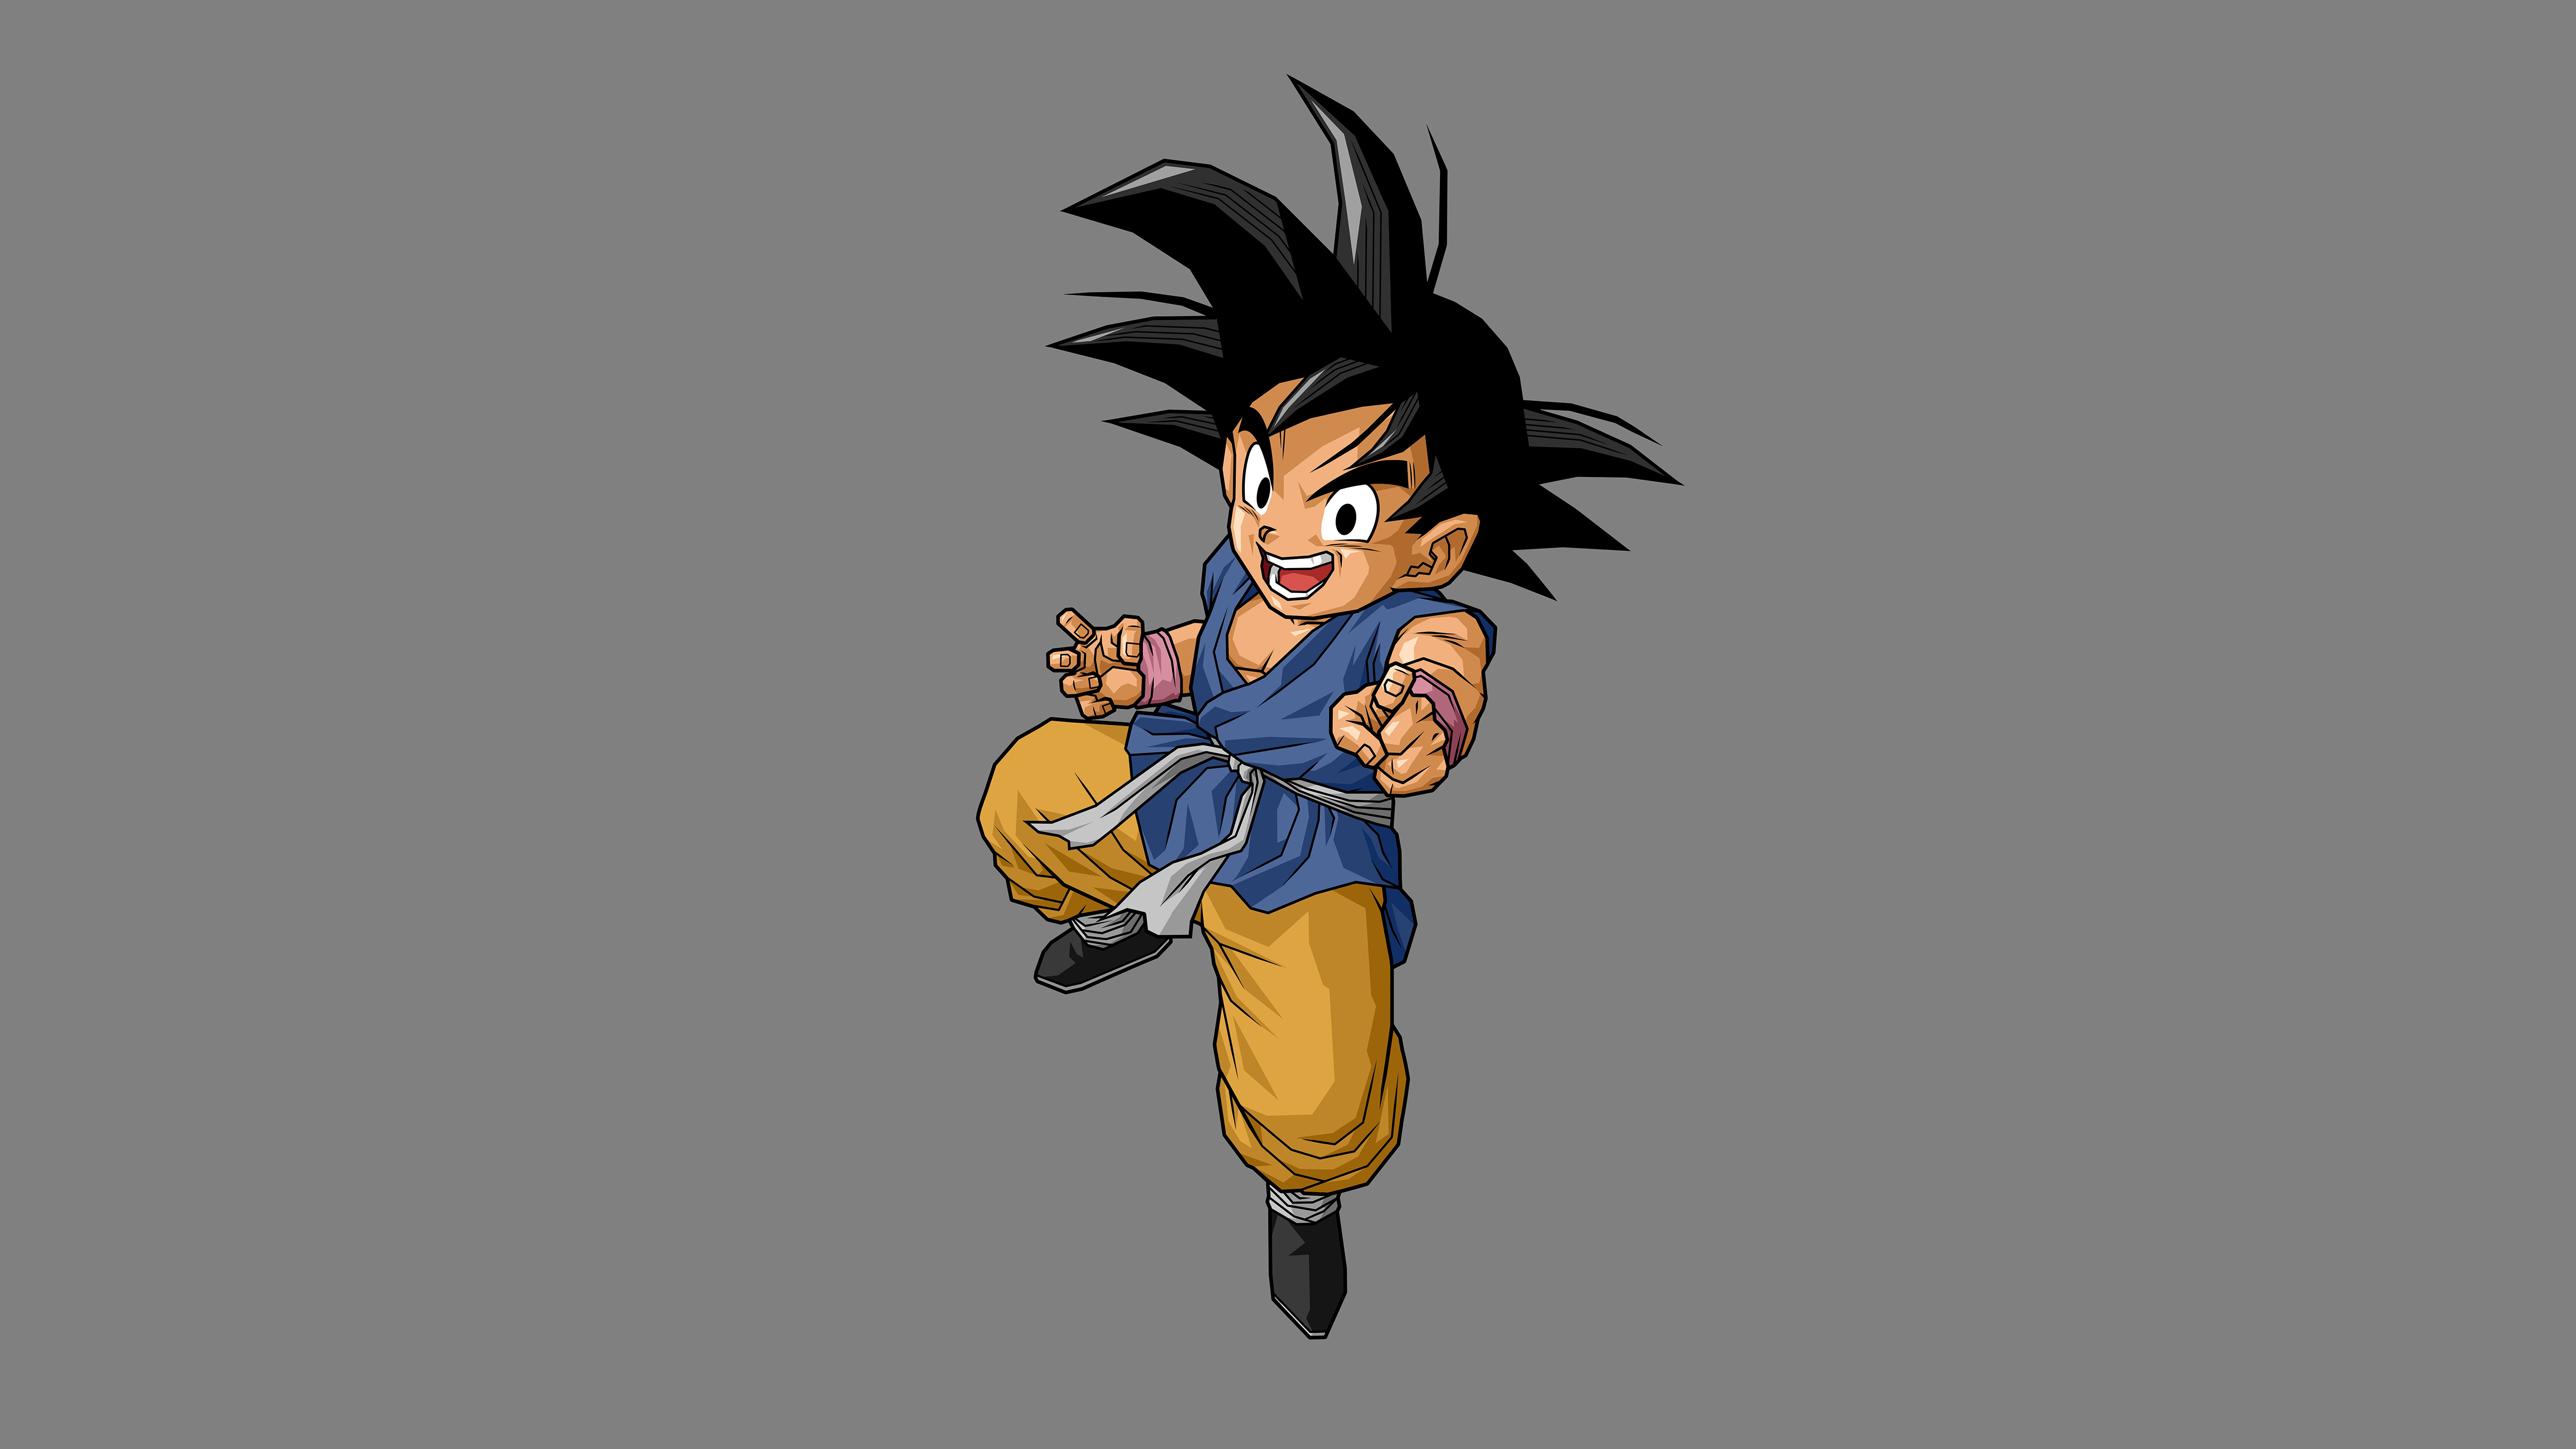 1280x2120 Dragon Ball Son Goku 5k Minimalism Iphone 6 Hd 4k